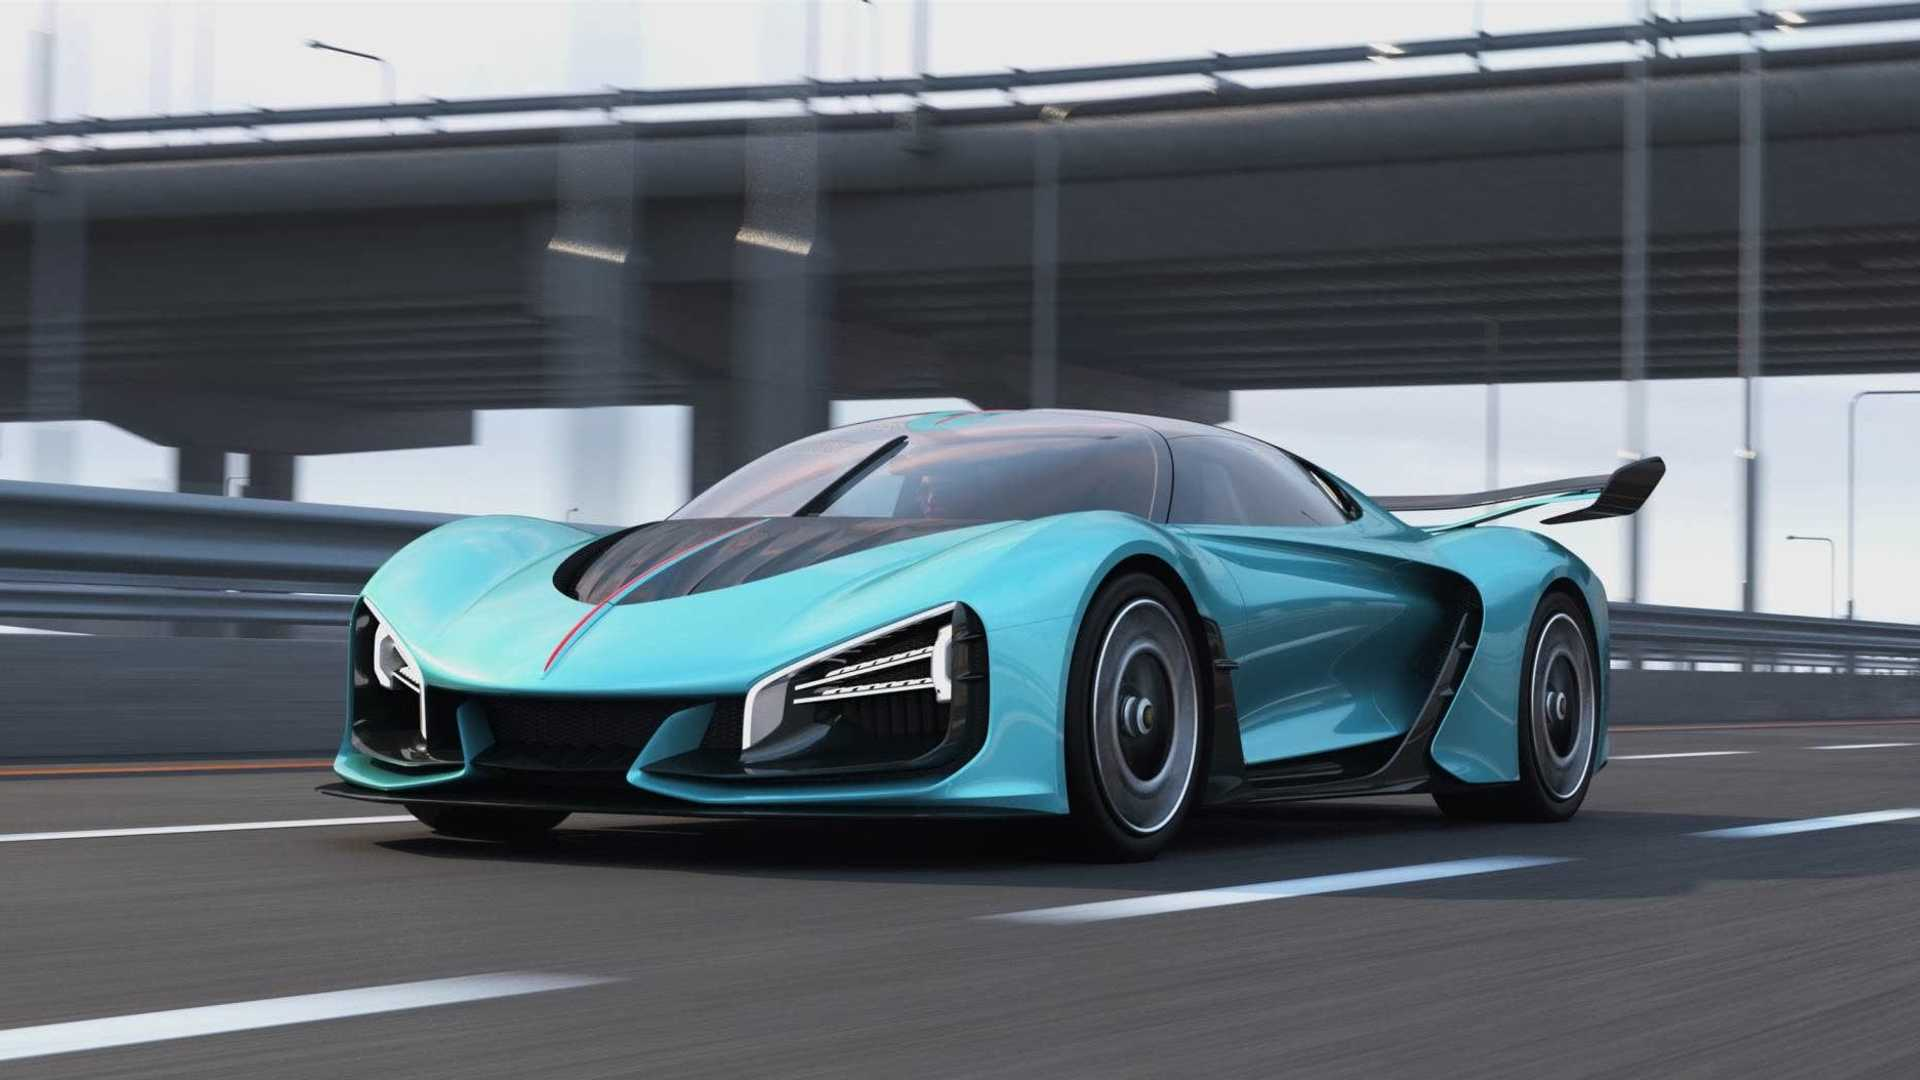 Types of Futuristic Cars